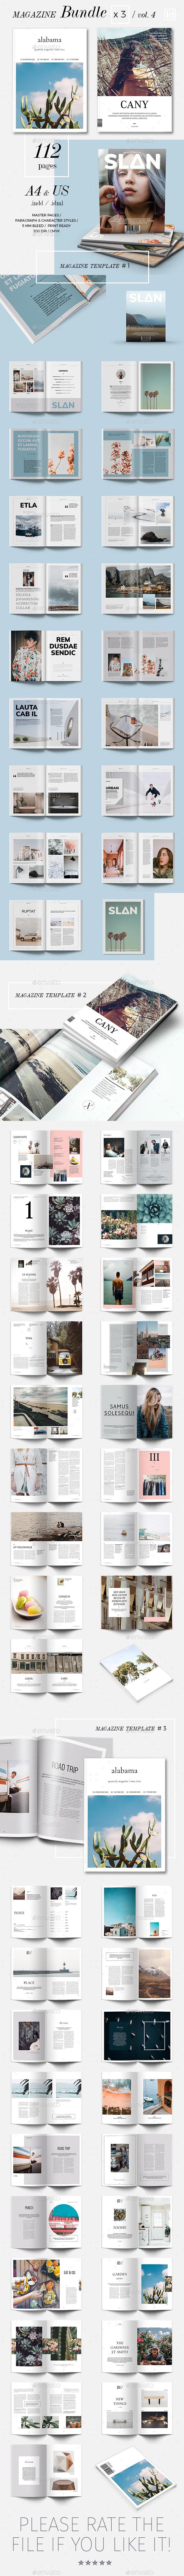 Magazine Template Bundle 04 - Magazines Print Templates